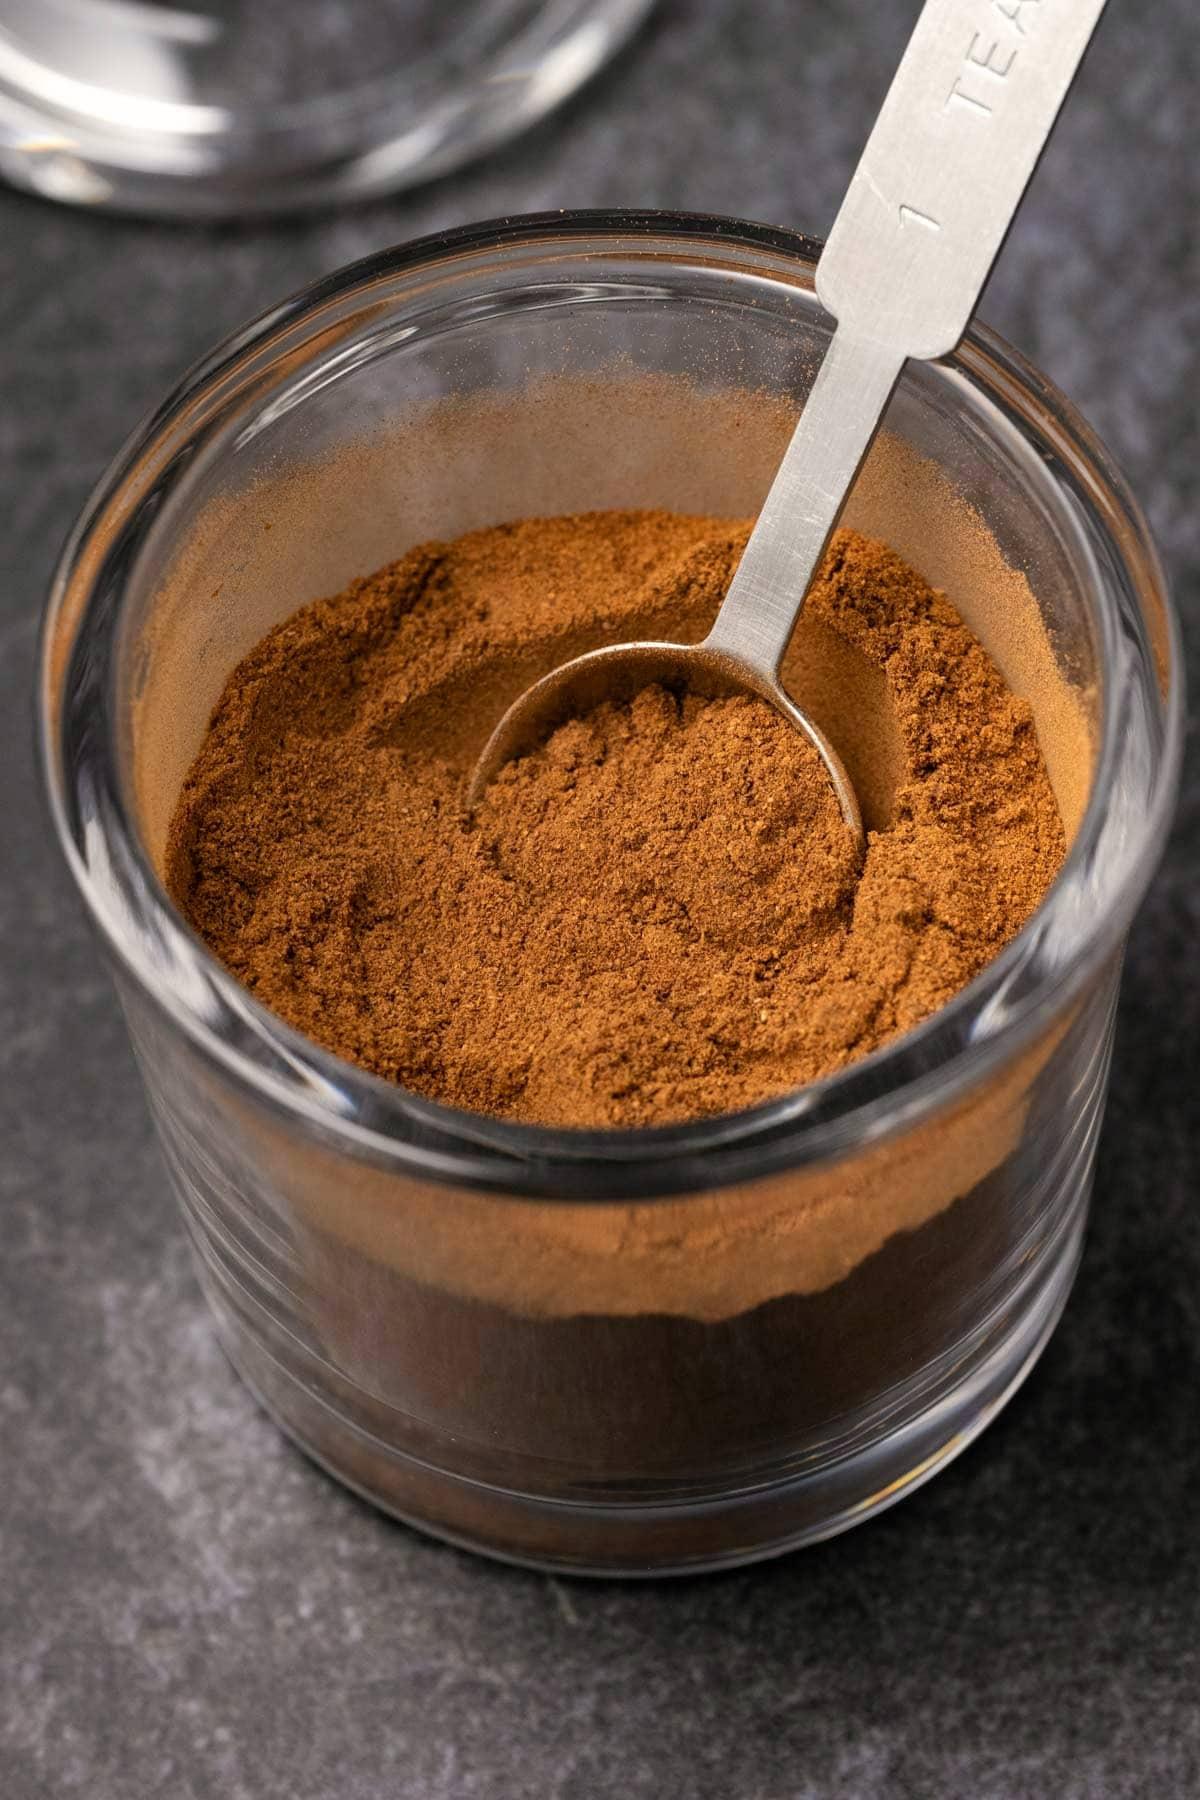 Pumpkin pie spice in a glass jar with a spoon.